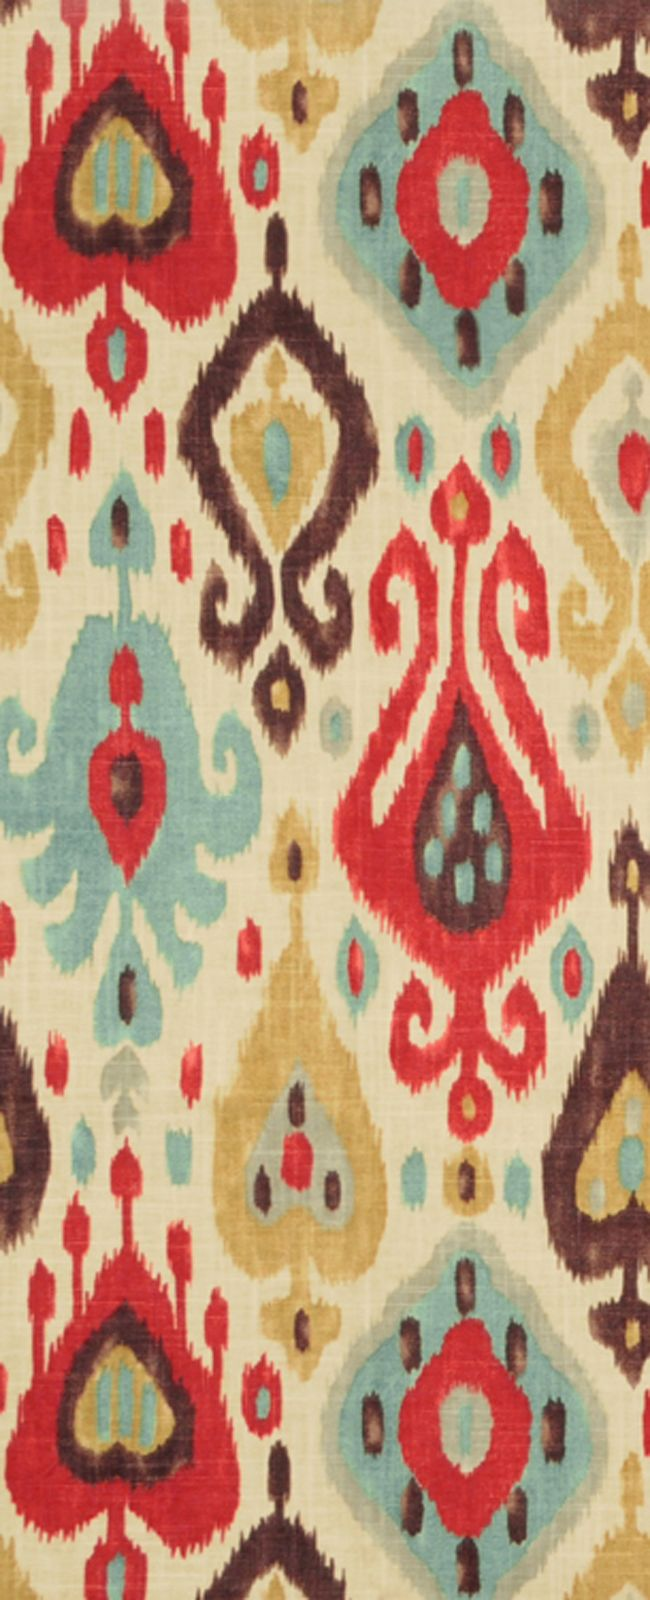 Fabric moreover teal ikat curtain panels on home decor fabric ikat - Red Blue And Brown Ikat Fabric Richloom Django Persia Fabric 19 00 Per Yard